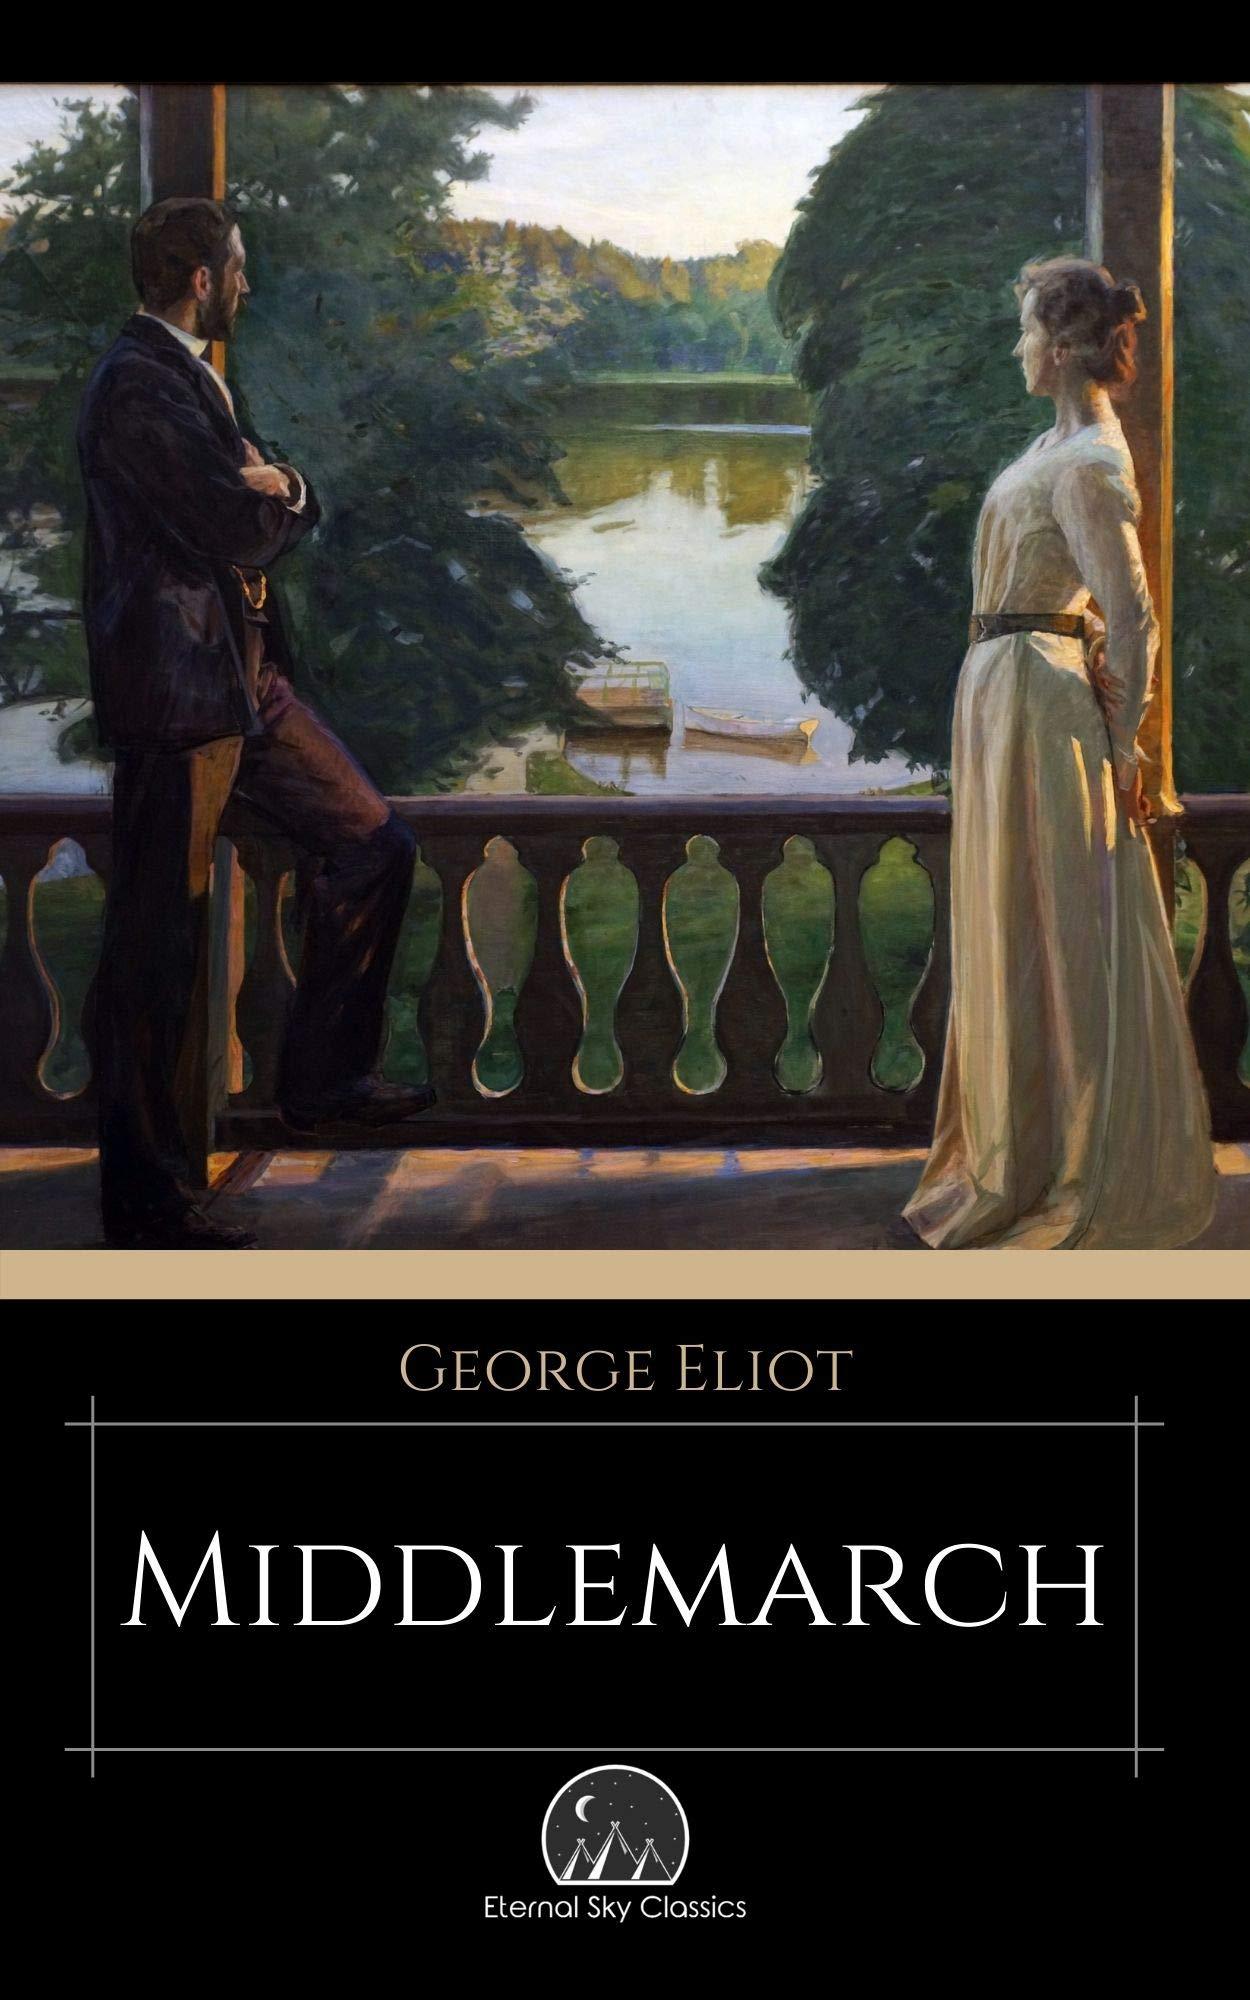 Middlemarch (Eternal Sky Classics Book 21)